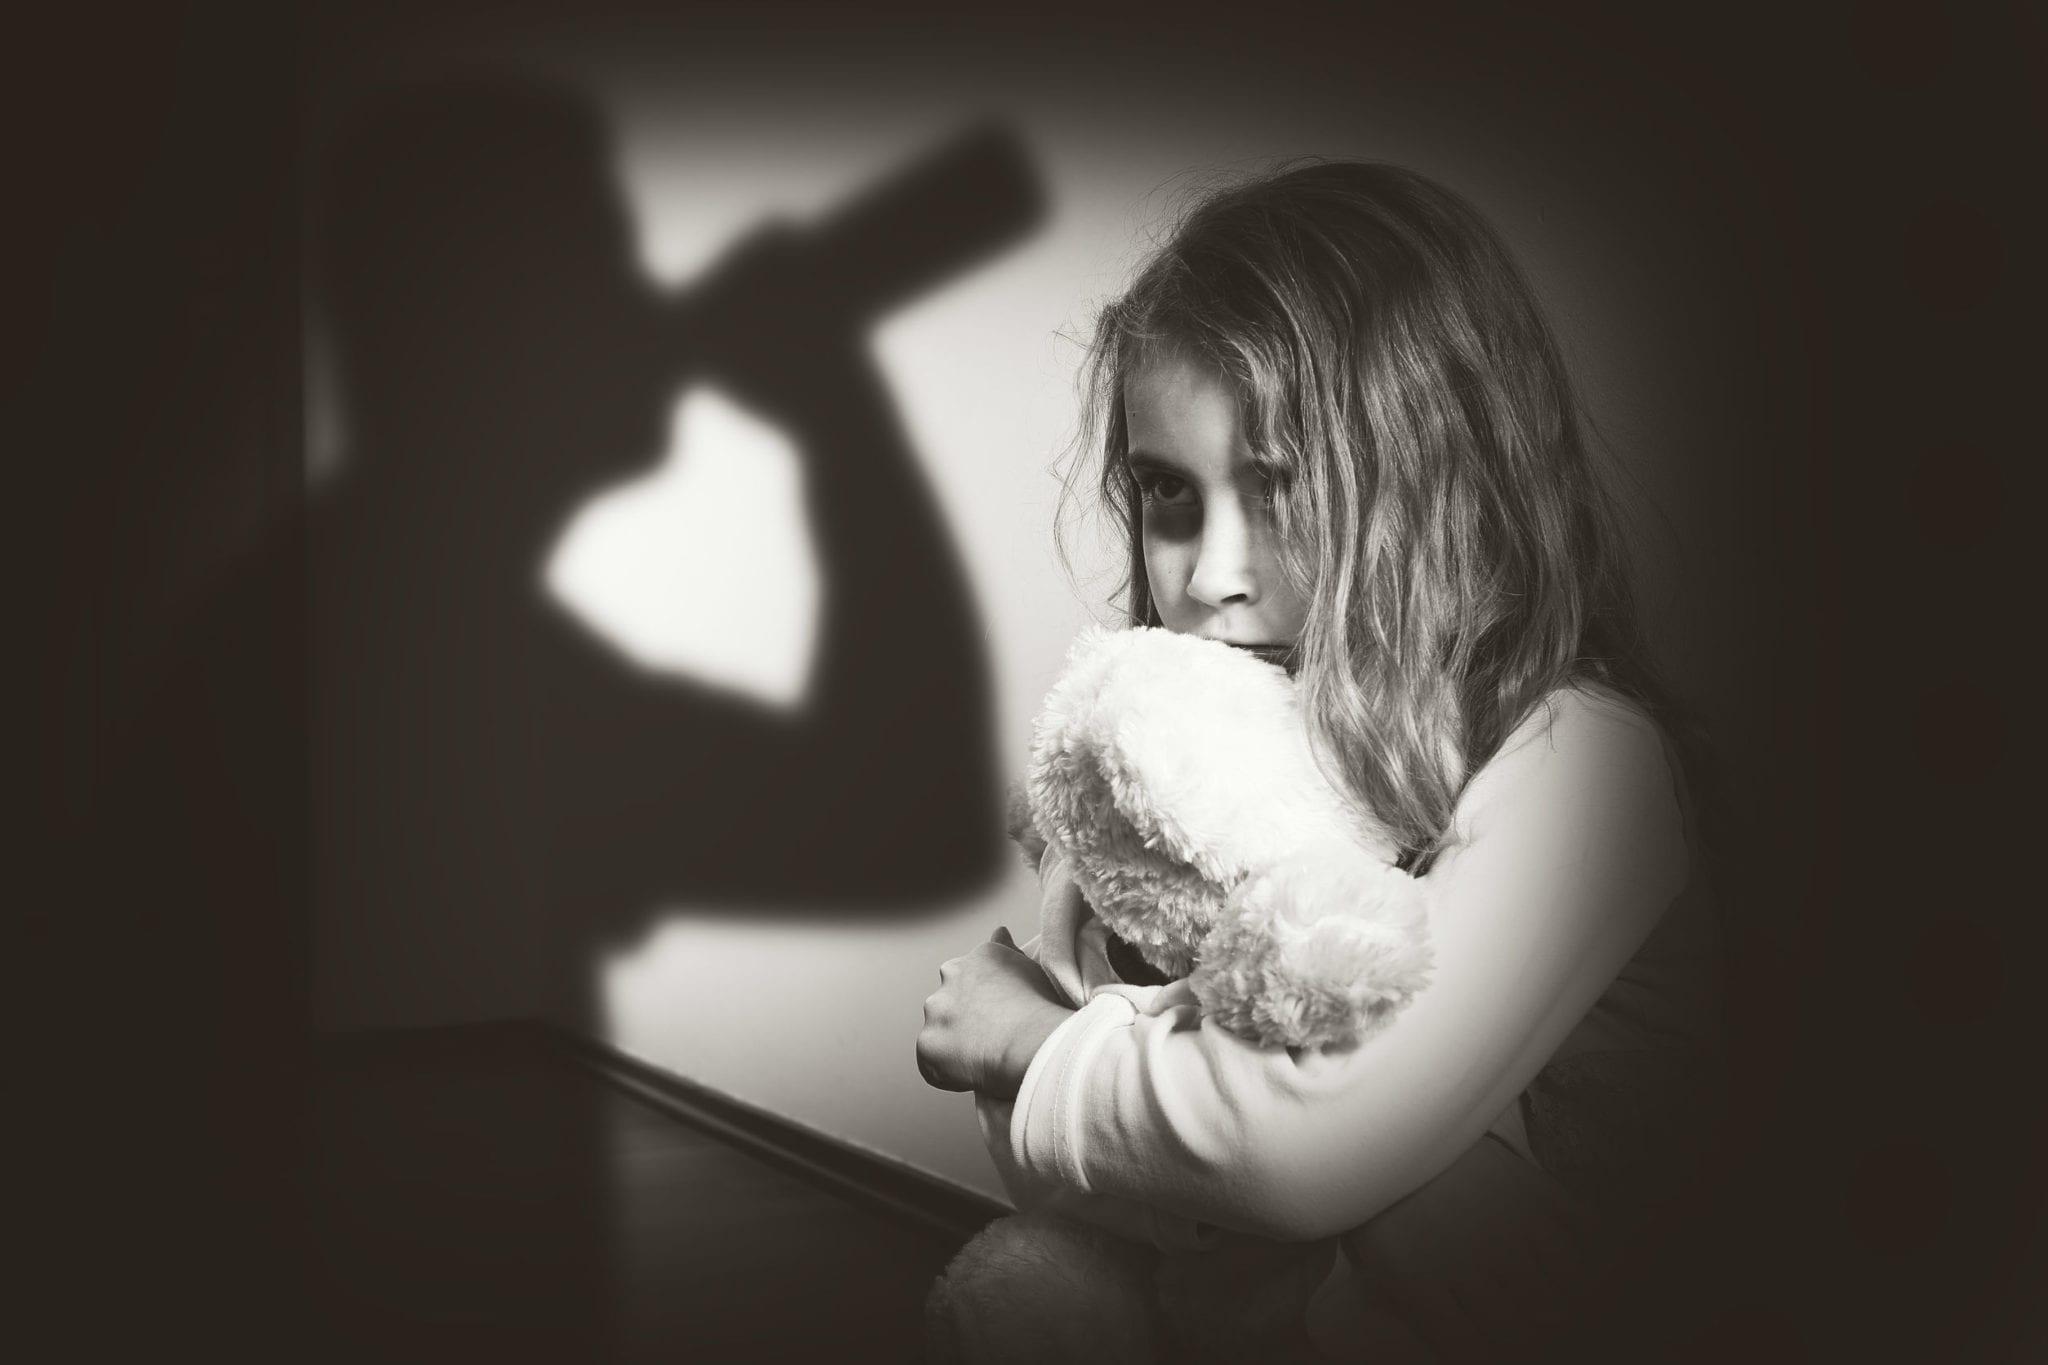 Defining Domestic Violence Under Texas Law